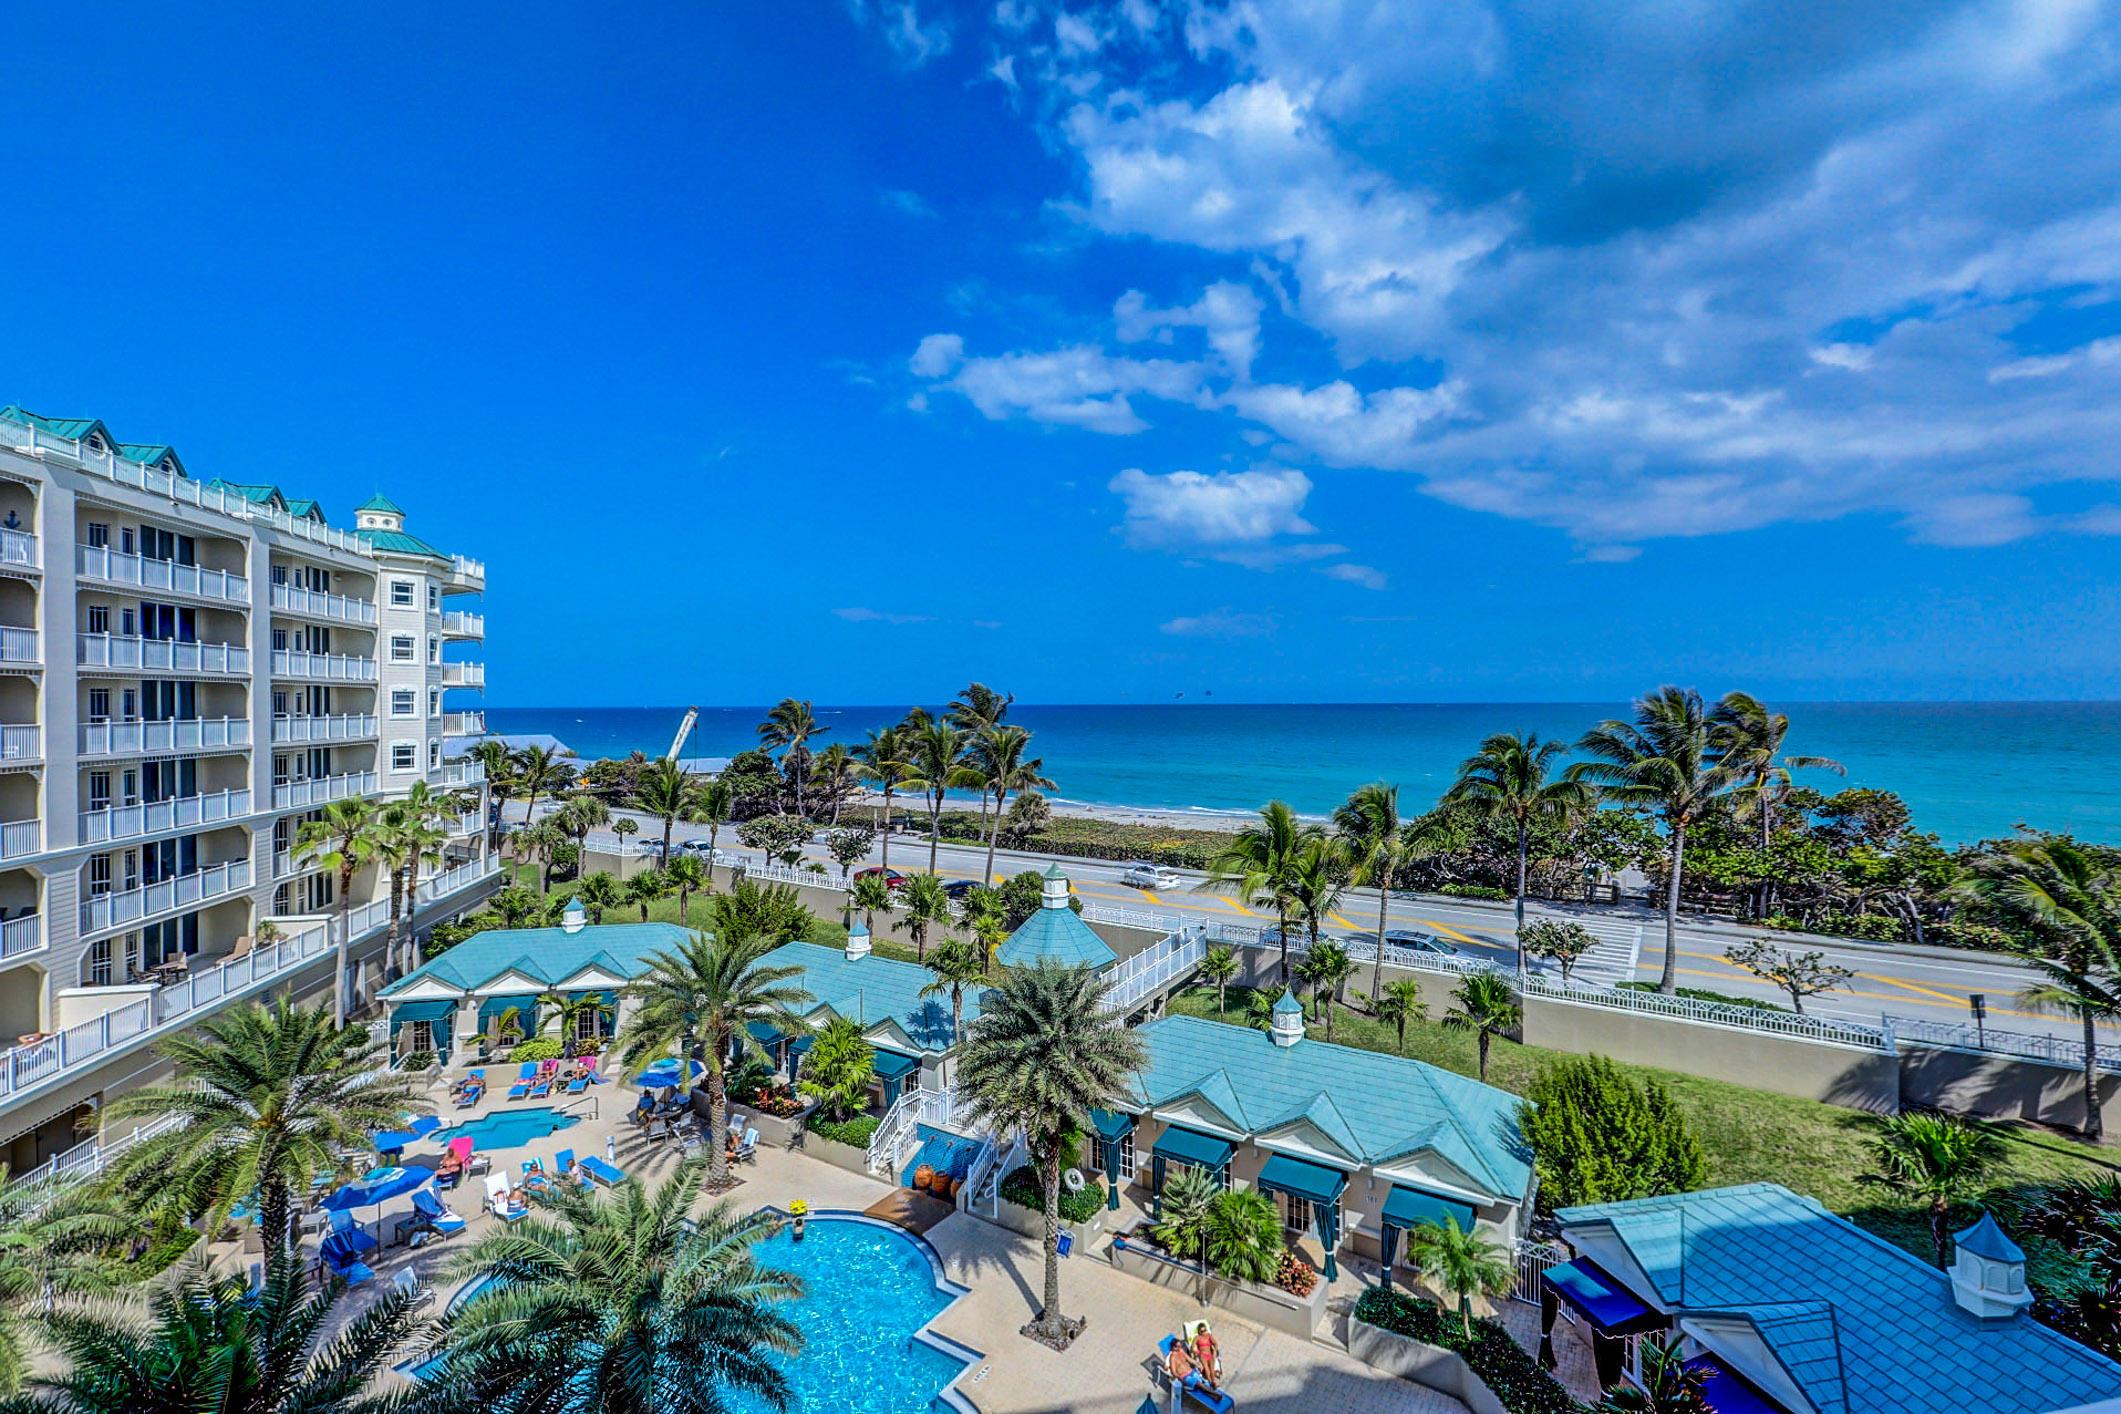 221 Ocean Grande Boulevard 602, Jupiter, Florida 33477, 3 Bedrooms Bedrooms, ,3.1 BathroomsBathrooms,A,Condominium,Ocean Grande,RX-10505337